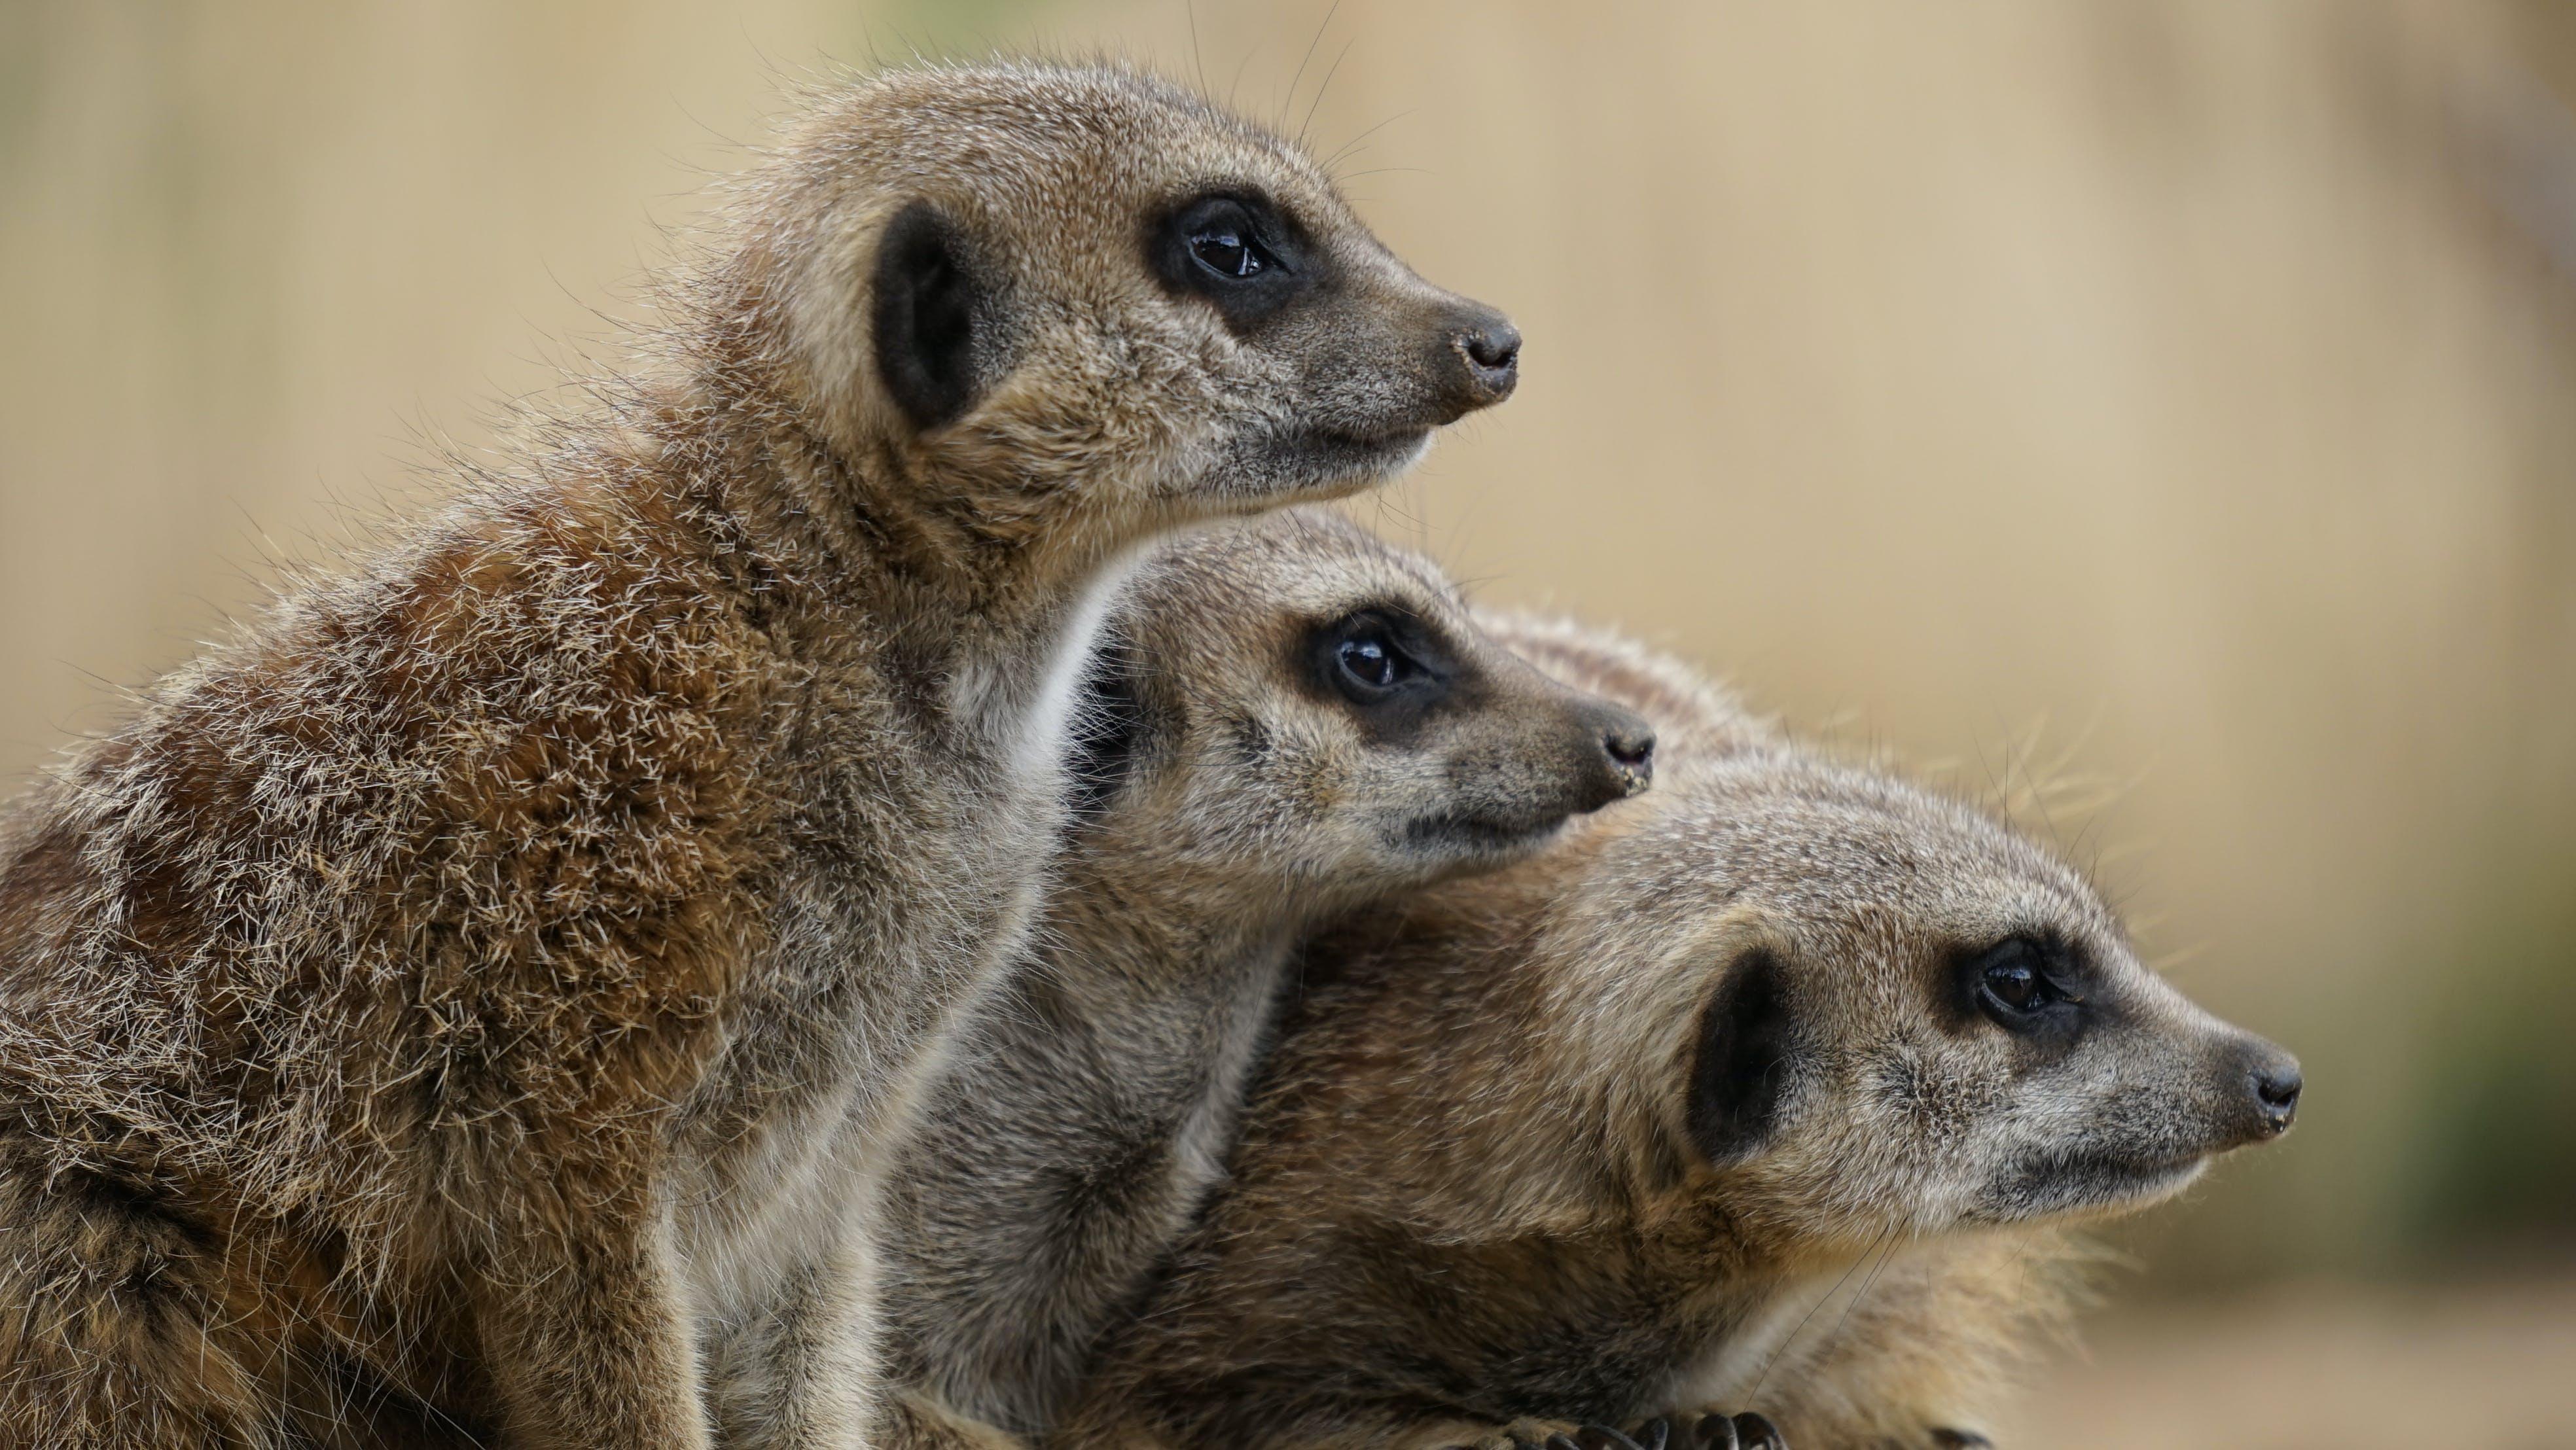 animals, mammals, meerkats